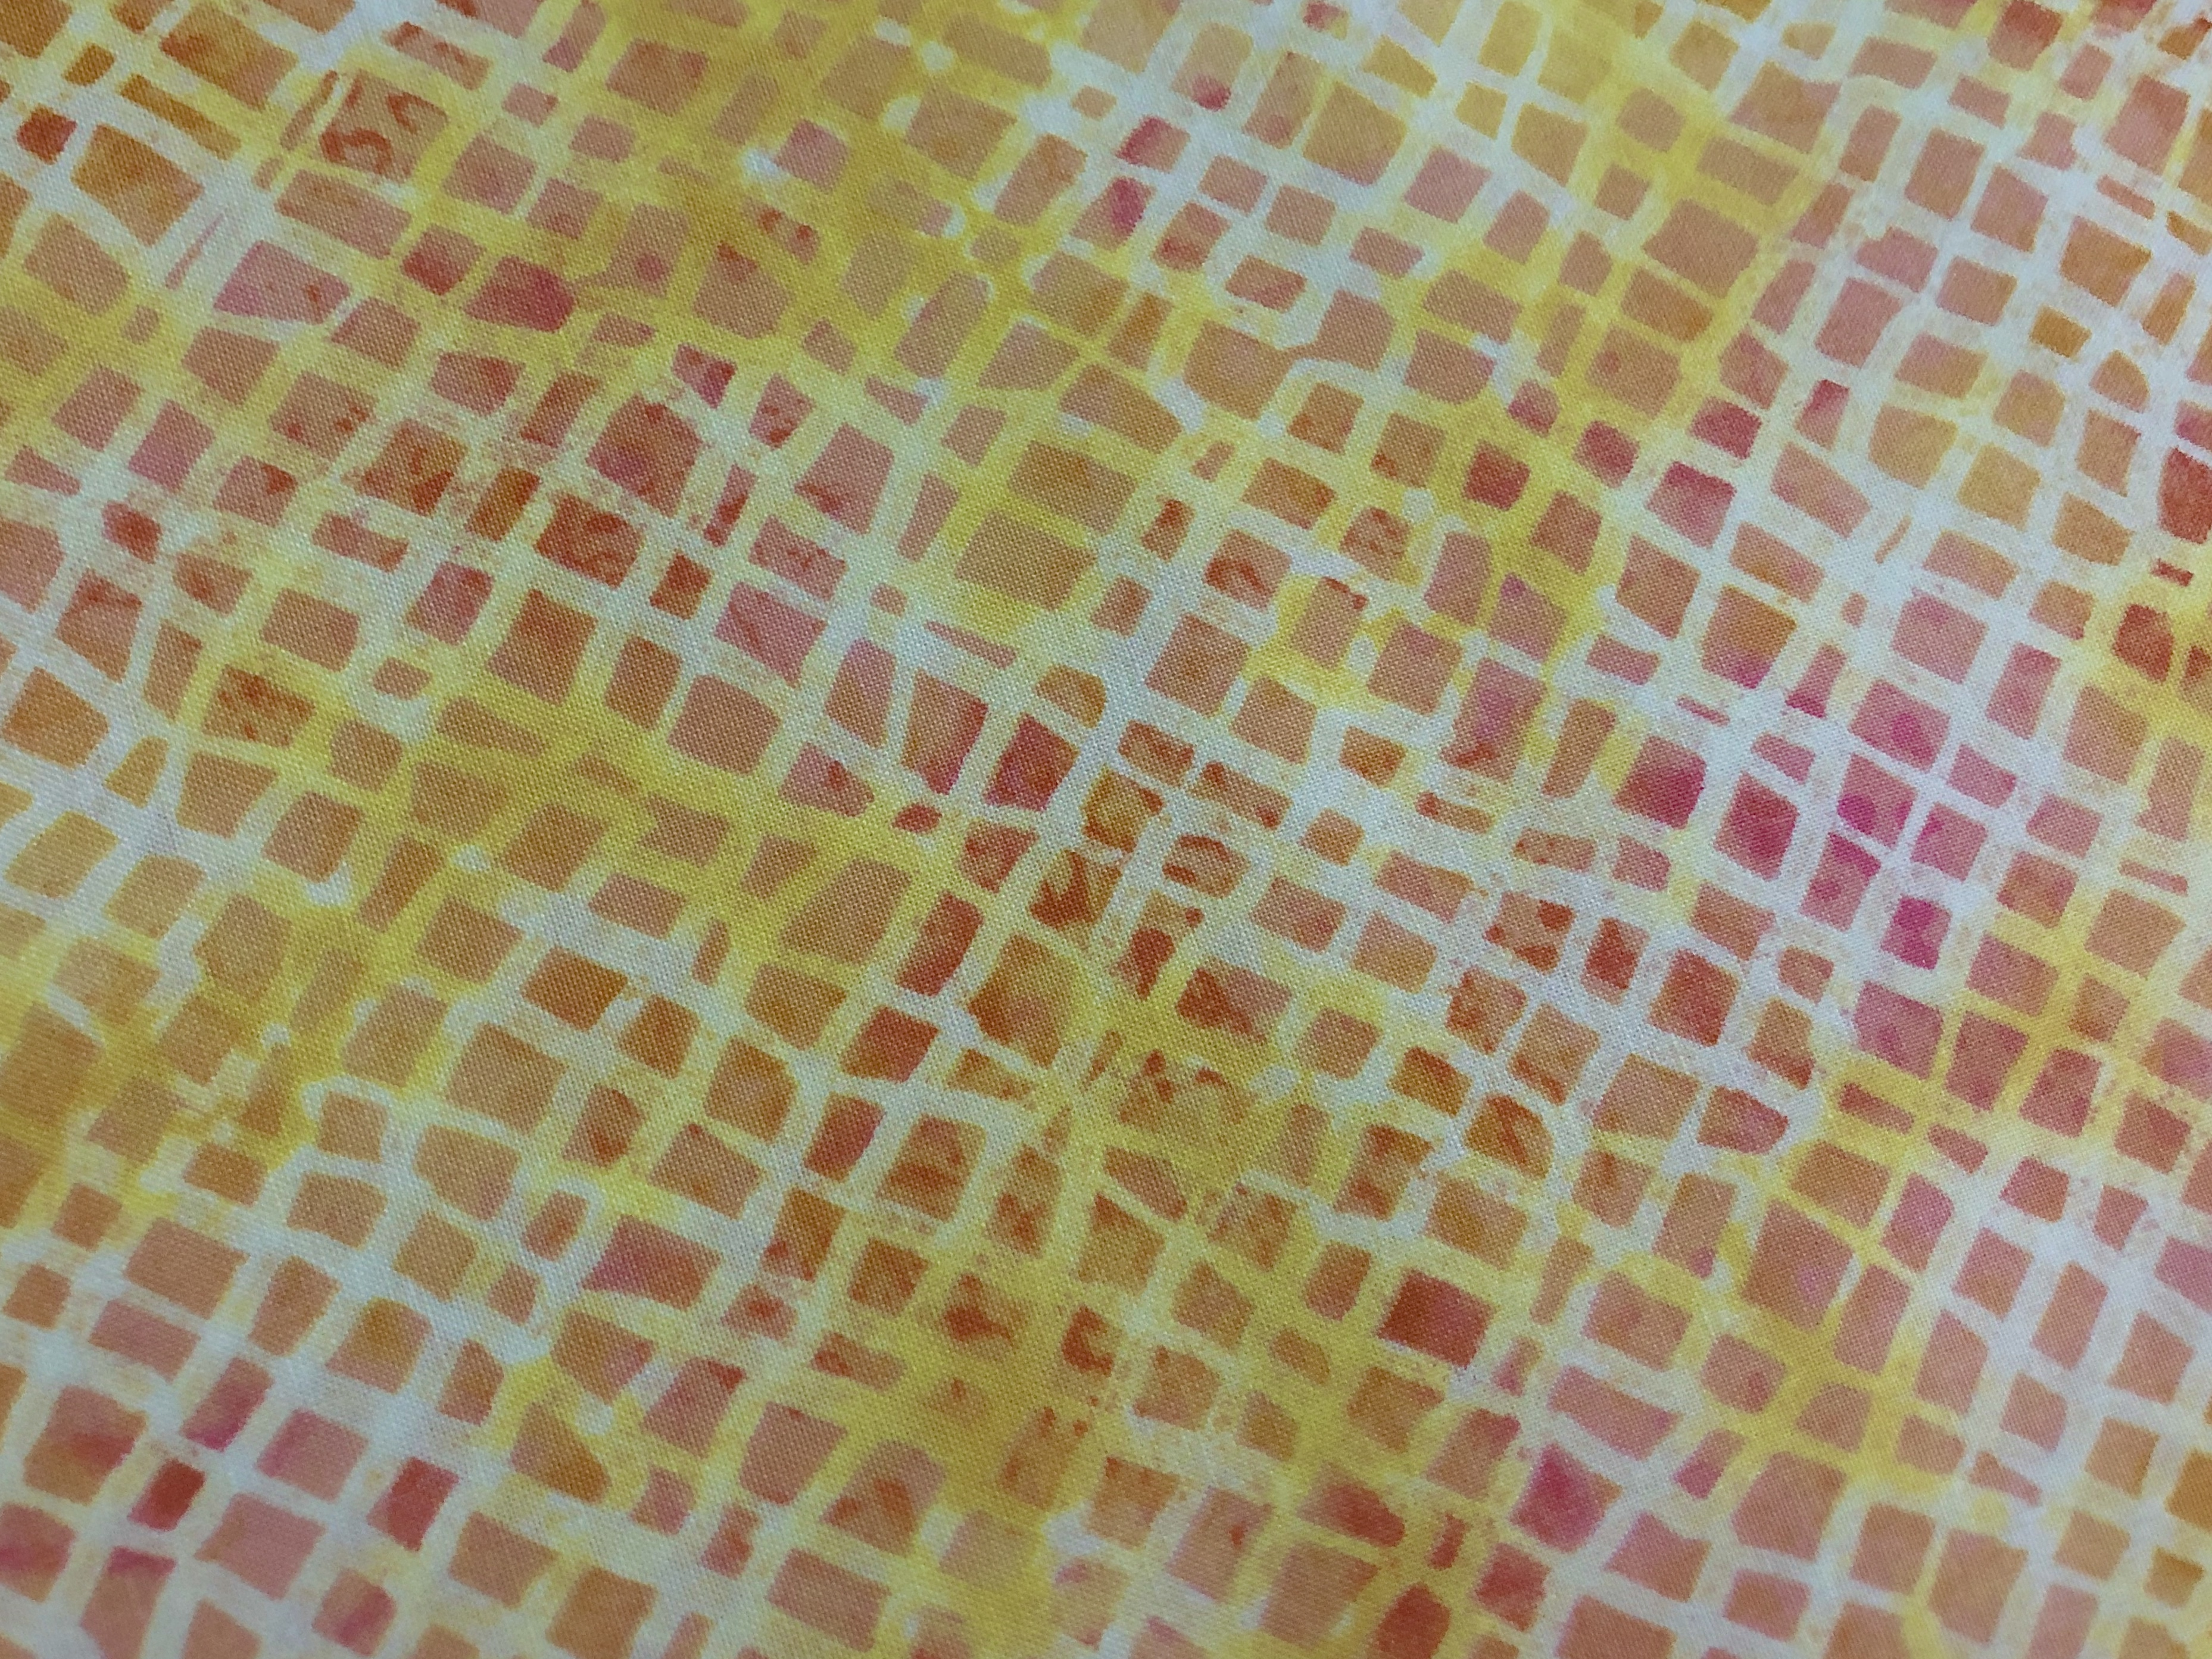 Freefoam Weave - Timeless Treasures - 1/2m cut 56338